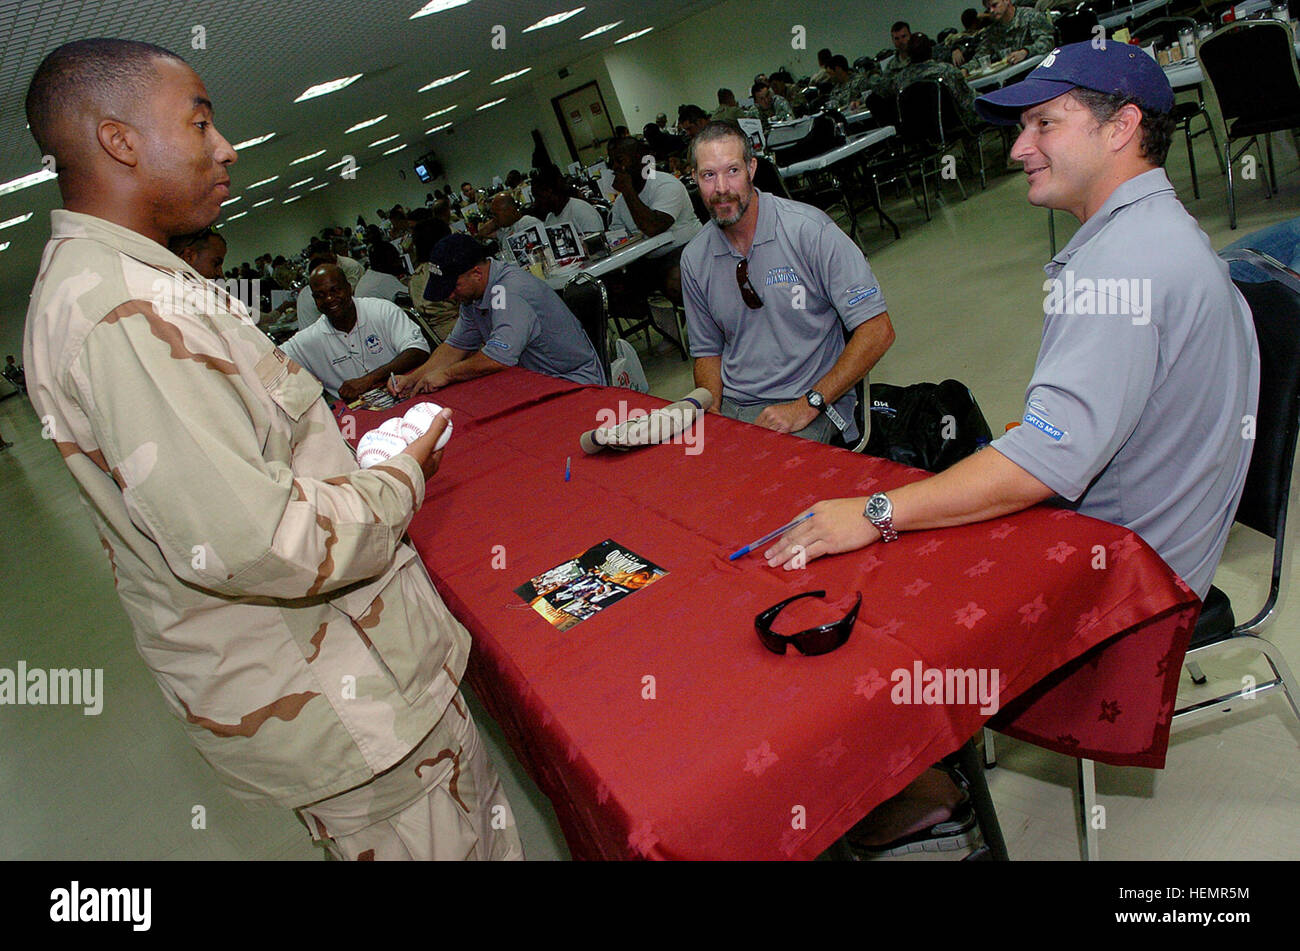 U.S. Navy Lt. Ivory Ervin, from Memphis, Tenn., questions Darren Bragg, a retired Major League Baseball player, - Stock Image